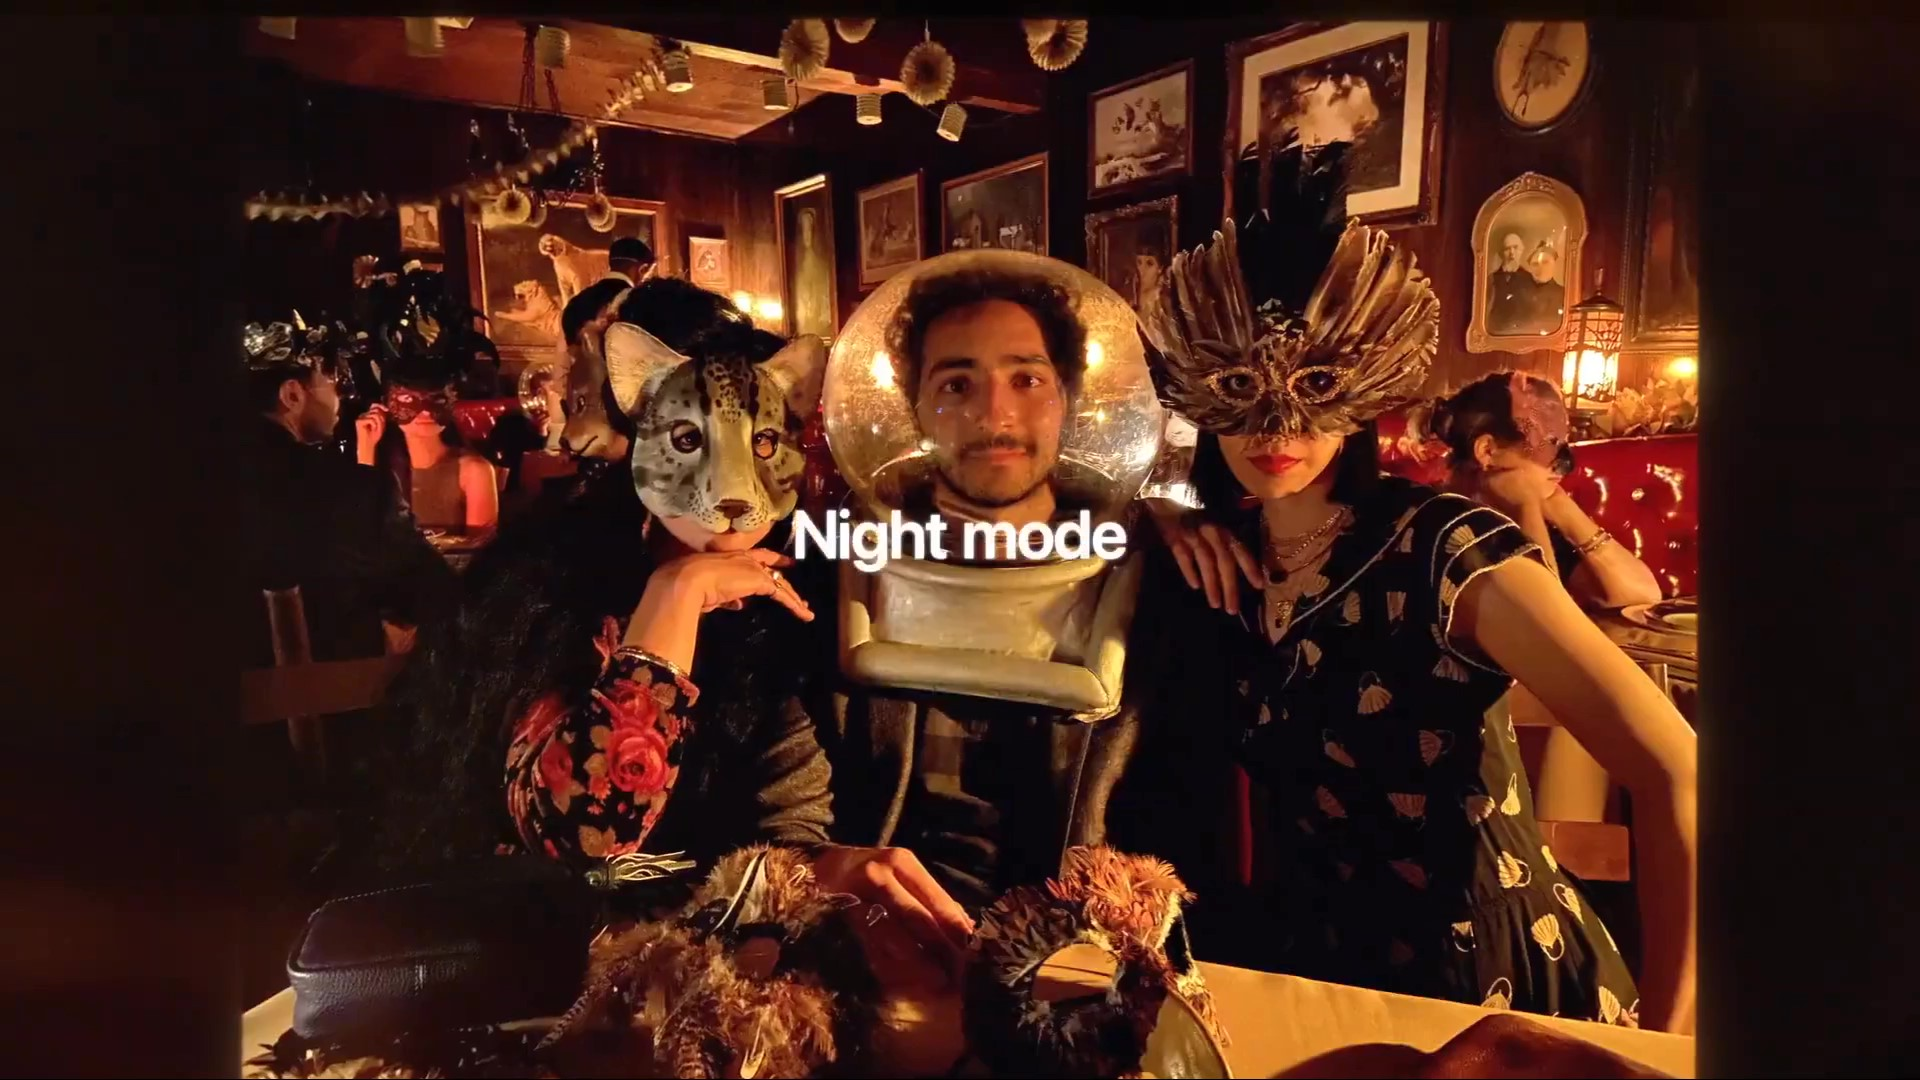 Night mode 夜拍功能